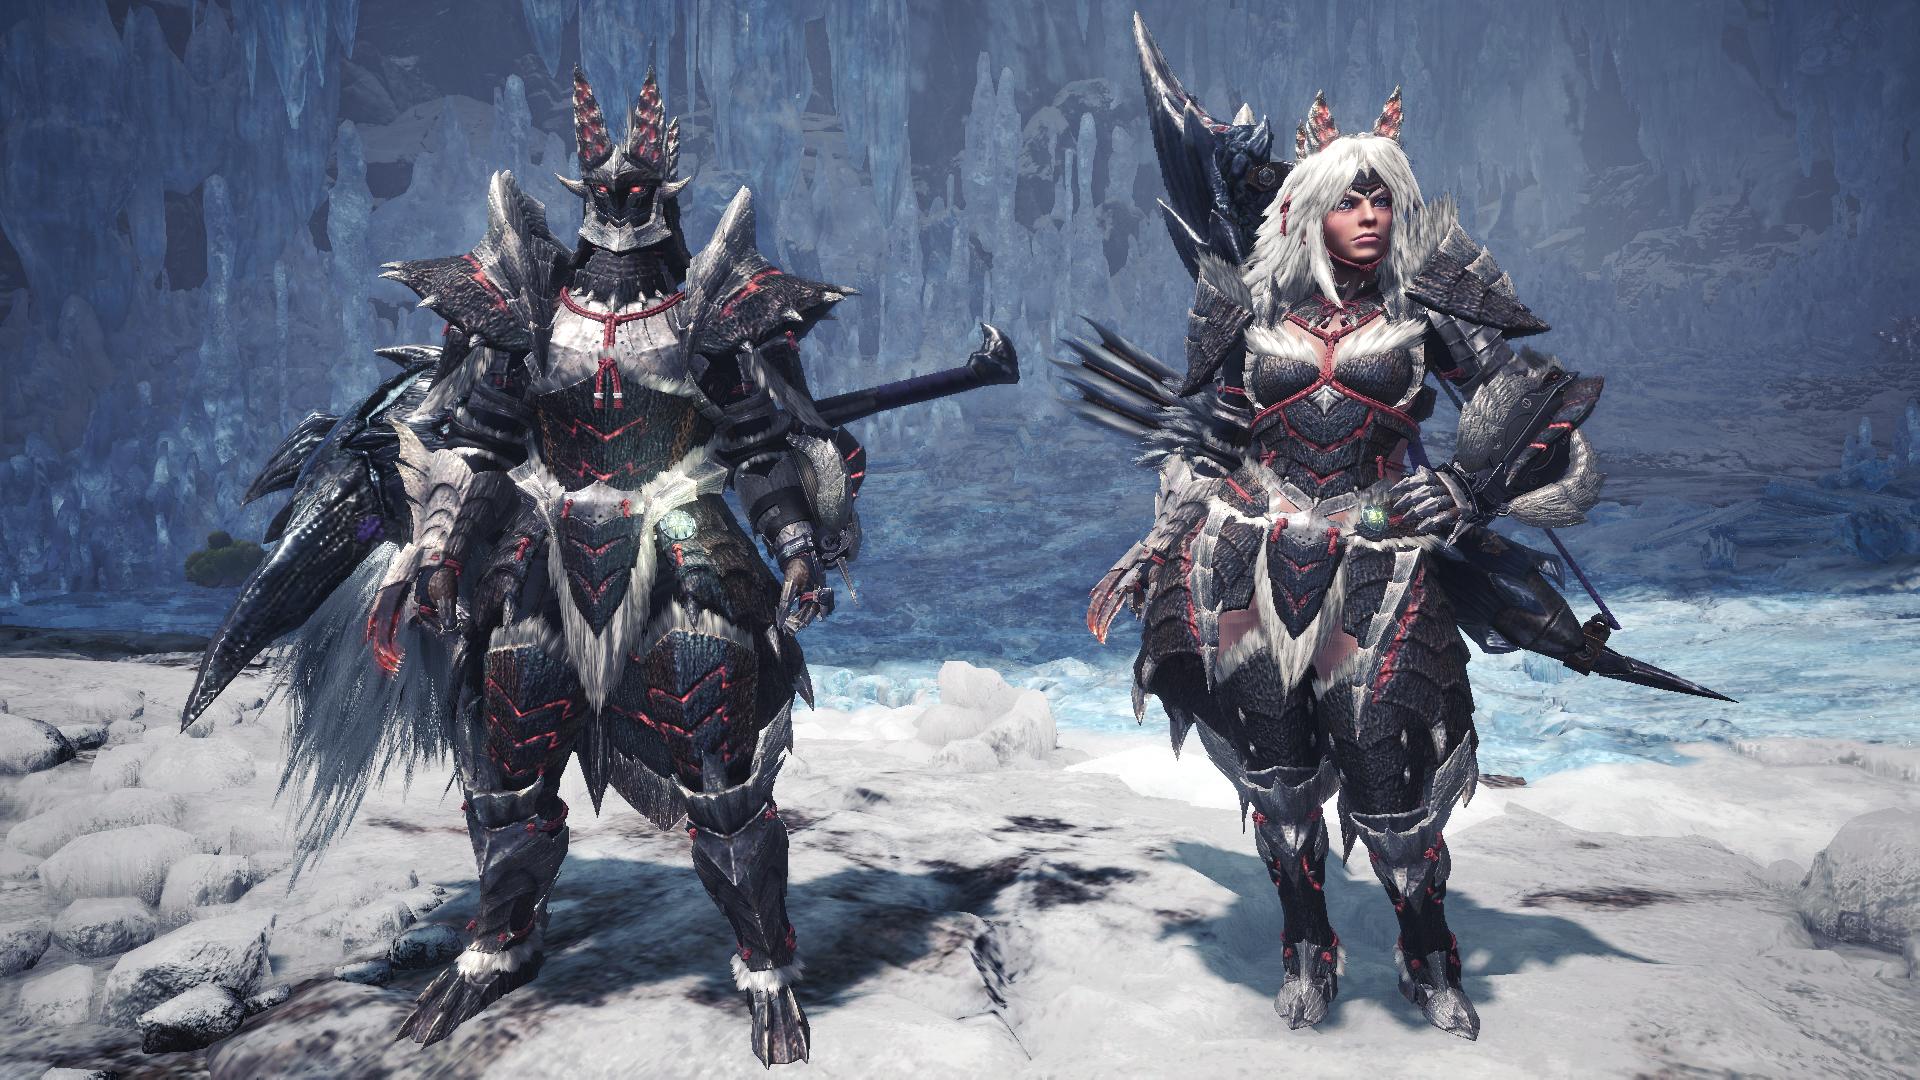 Monster Hunter World Iceborne S Second Title Update Adds Stygian